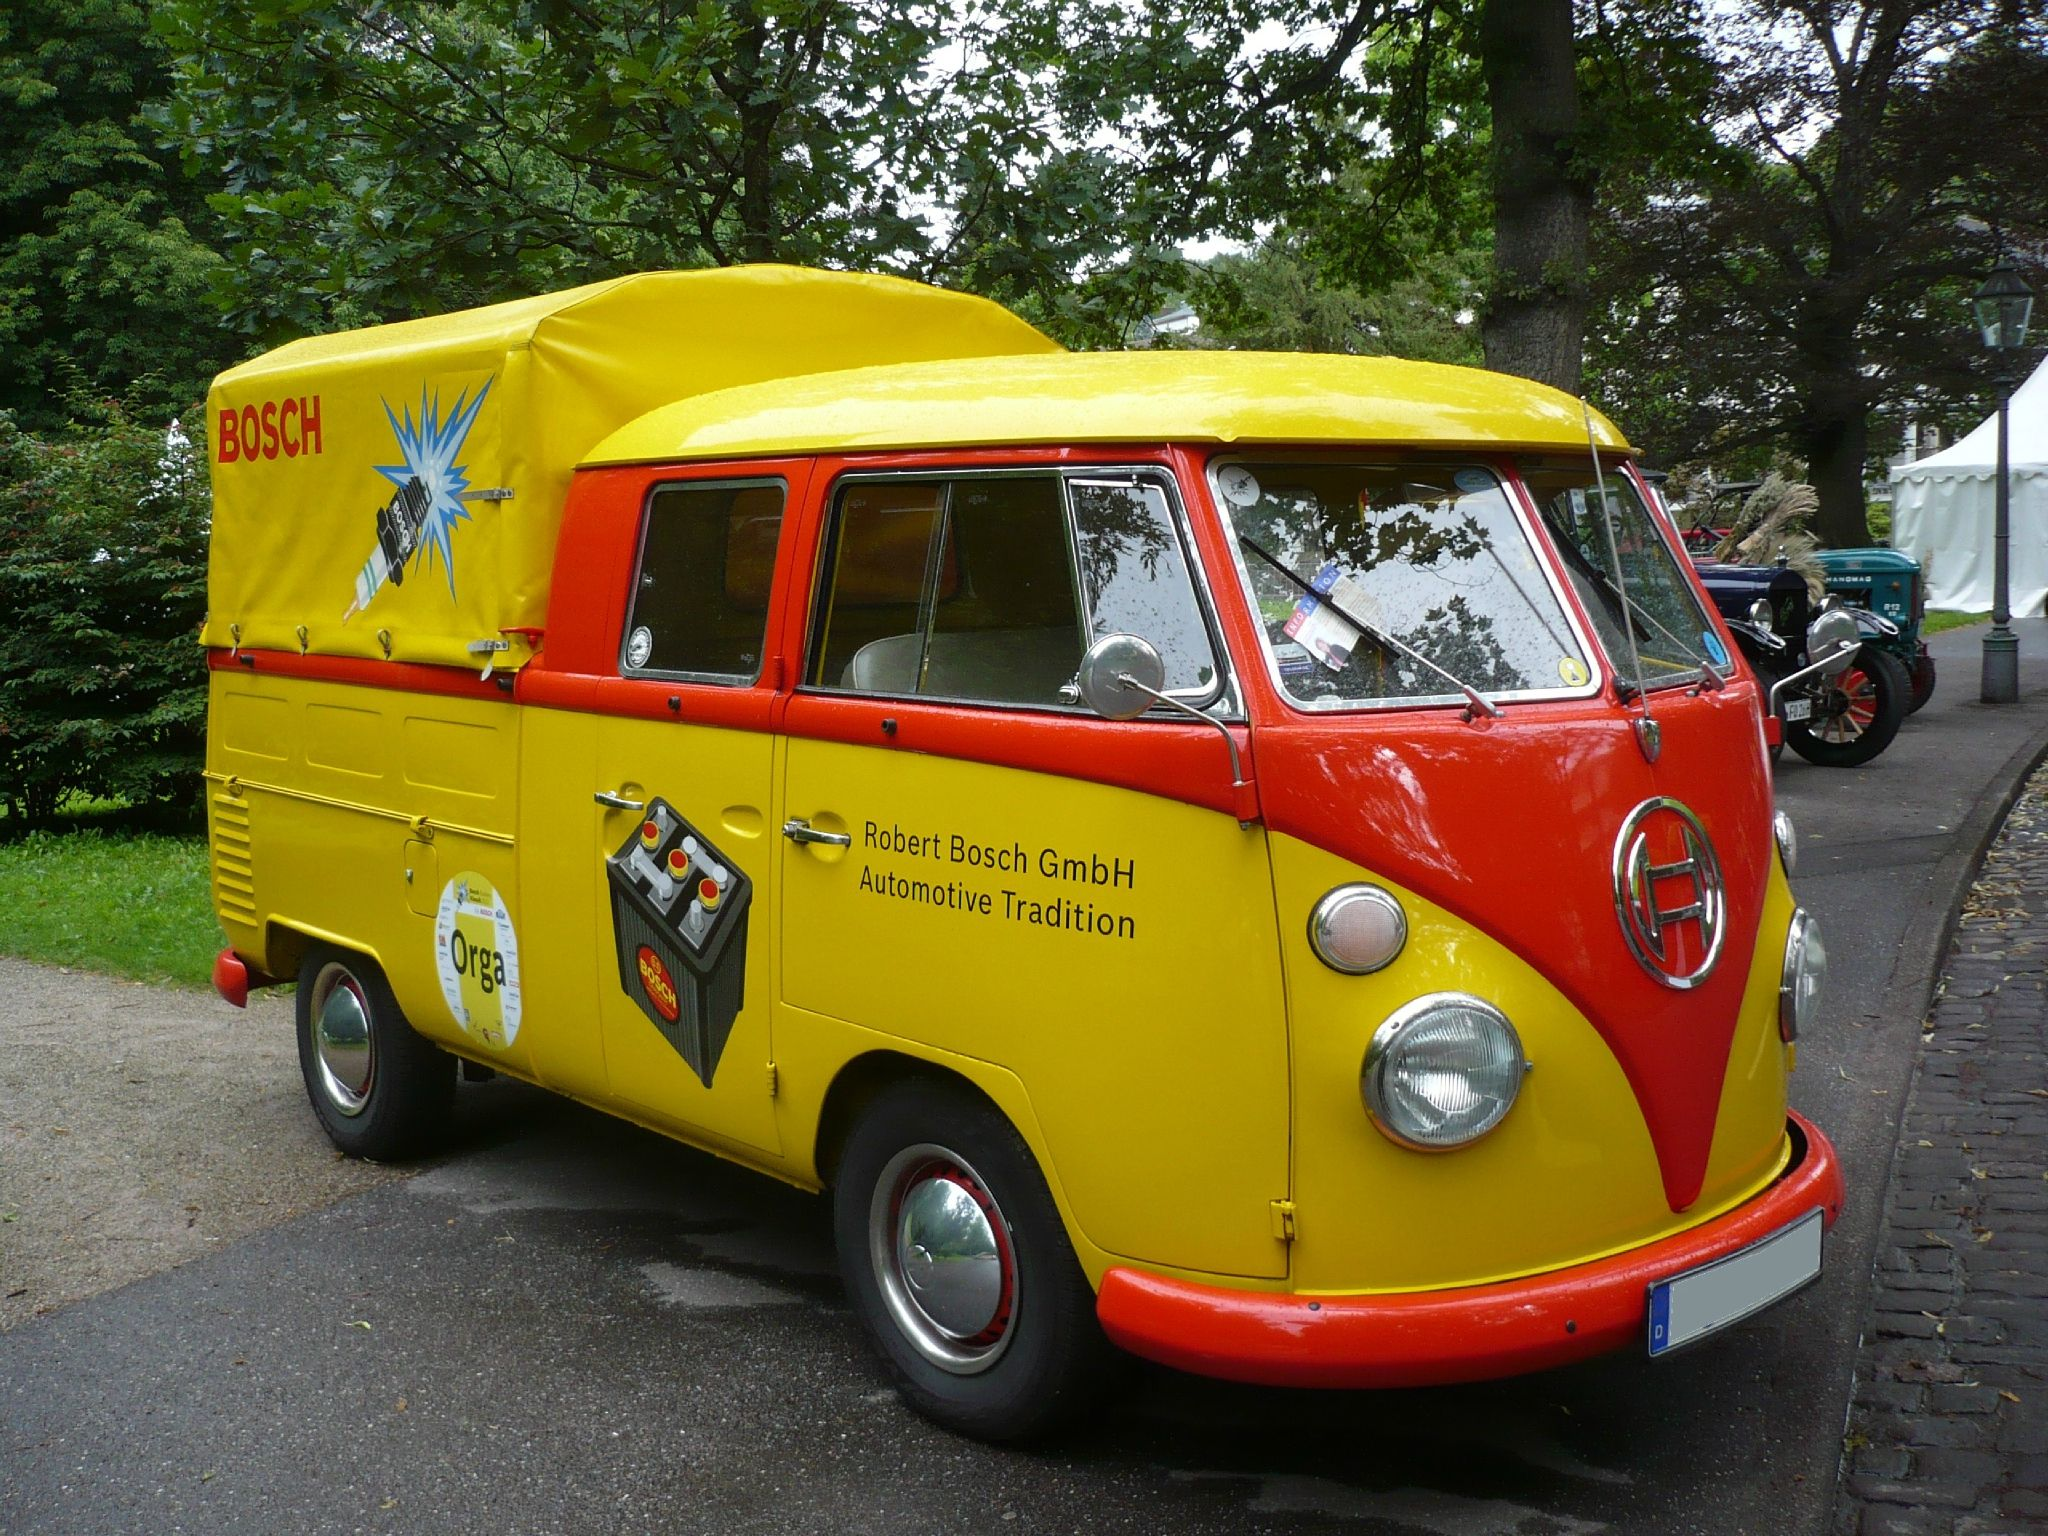 volkswagen combi split doka pick up b ch double cabine baden baden 1 vw doka sinka. Black Bedroom Furniture Sets. Home Design Ideas